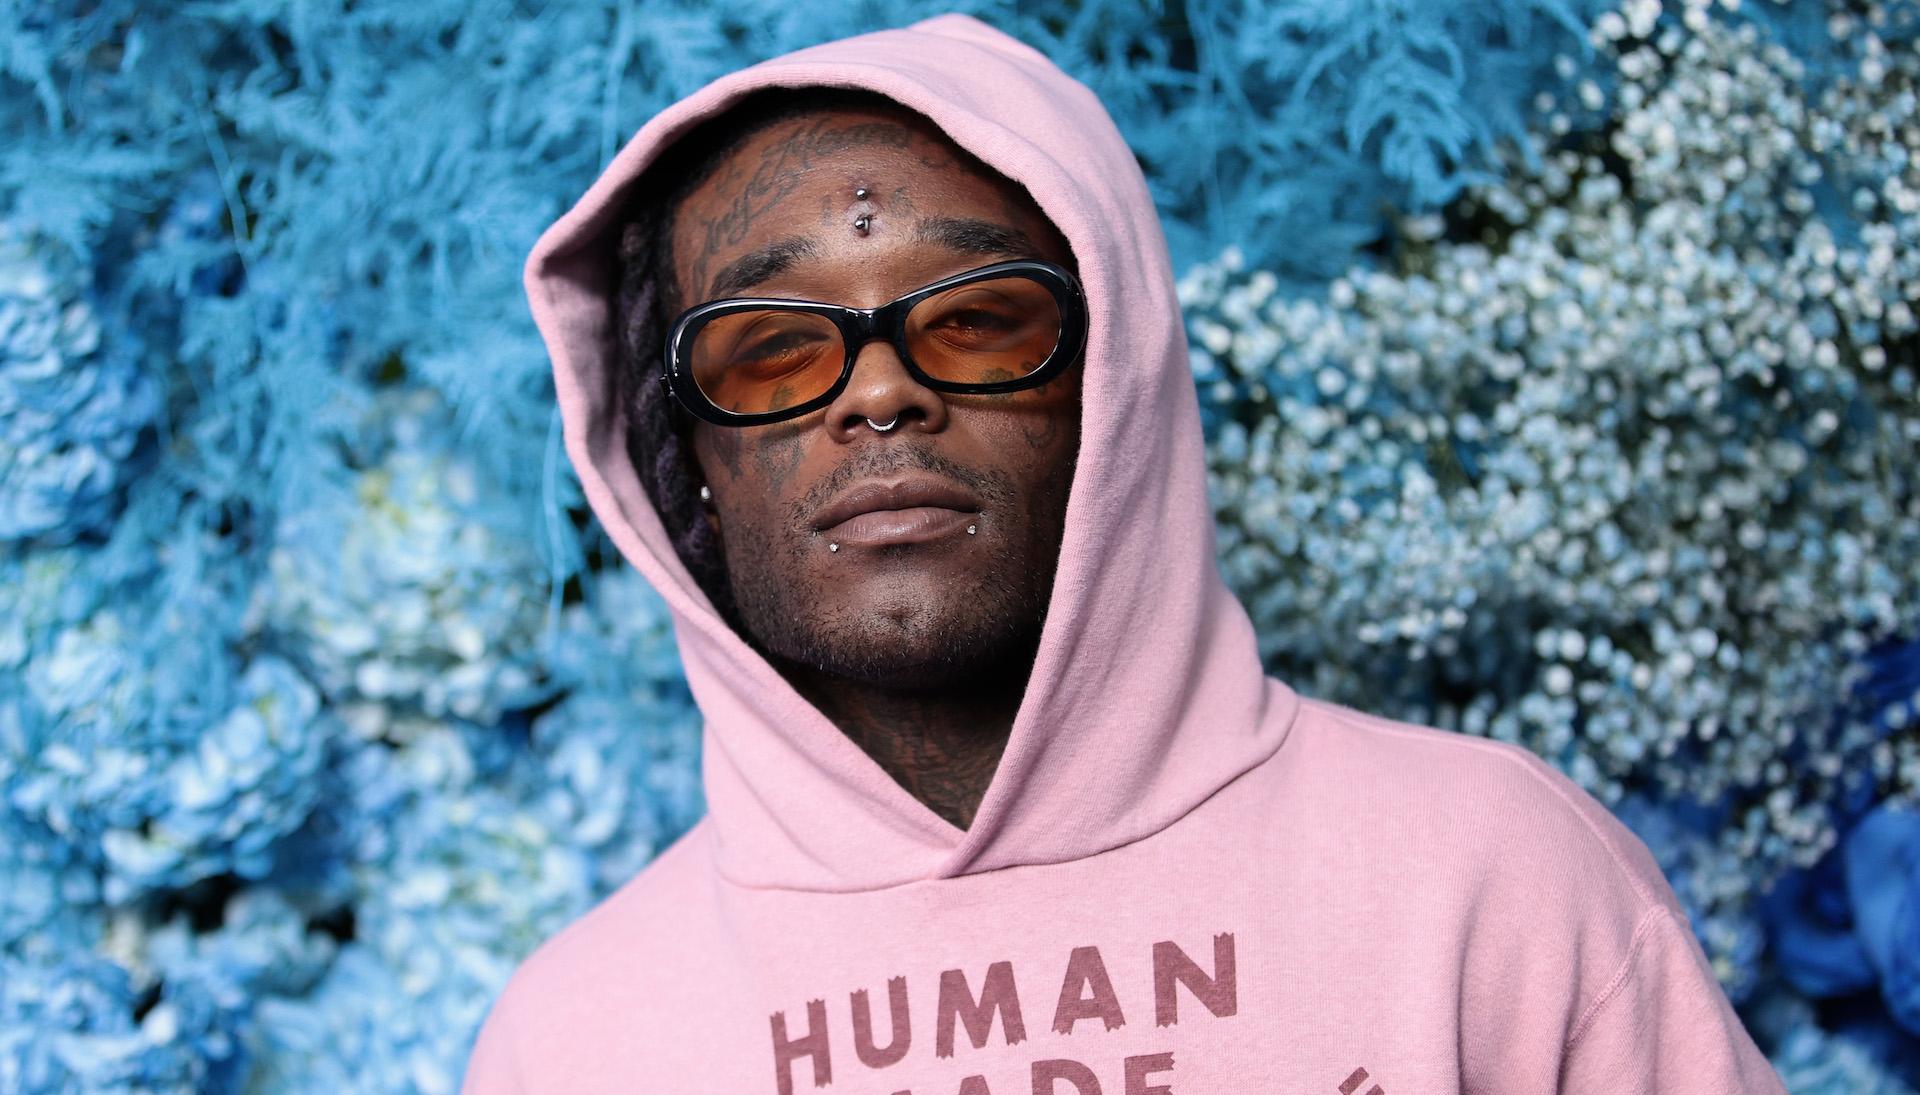 Lil Uzi Vert Provides Update on 'Pink Tape' Project